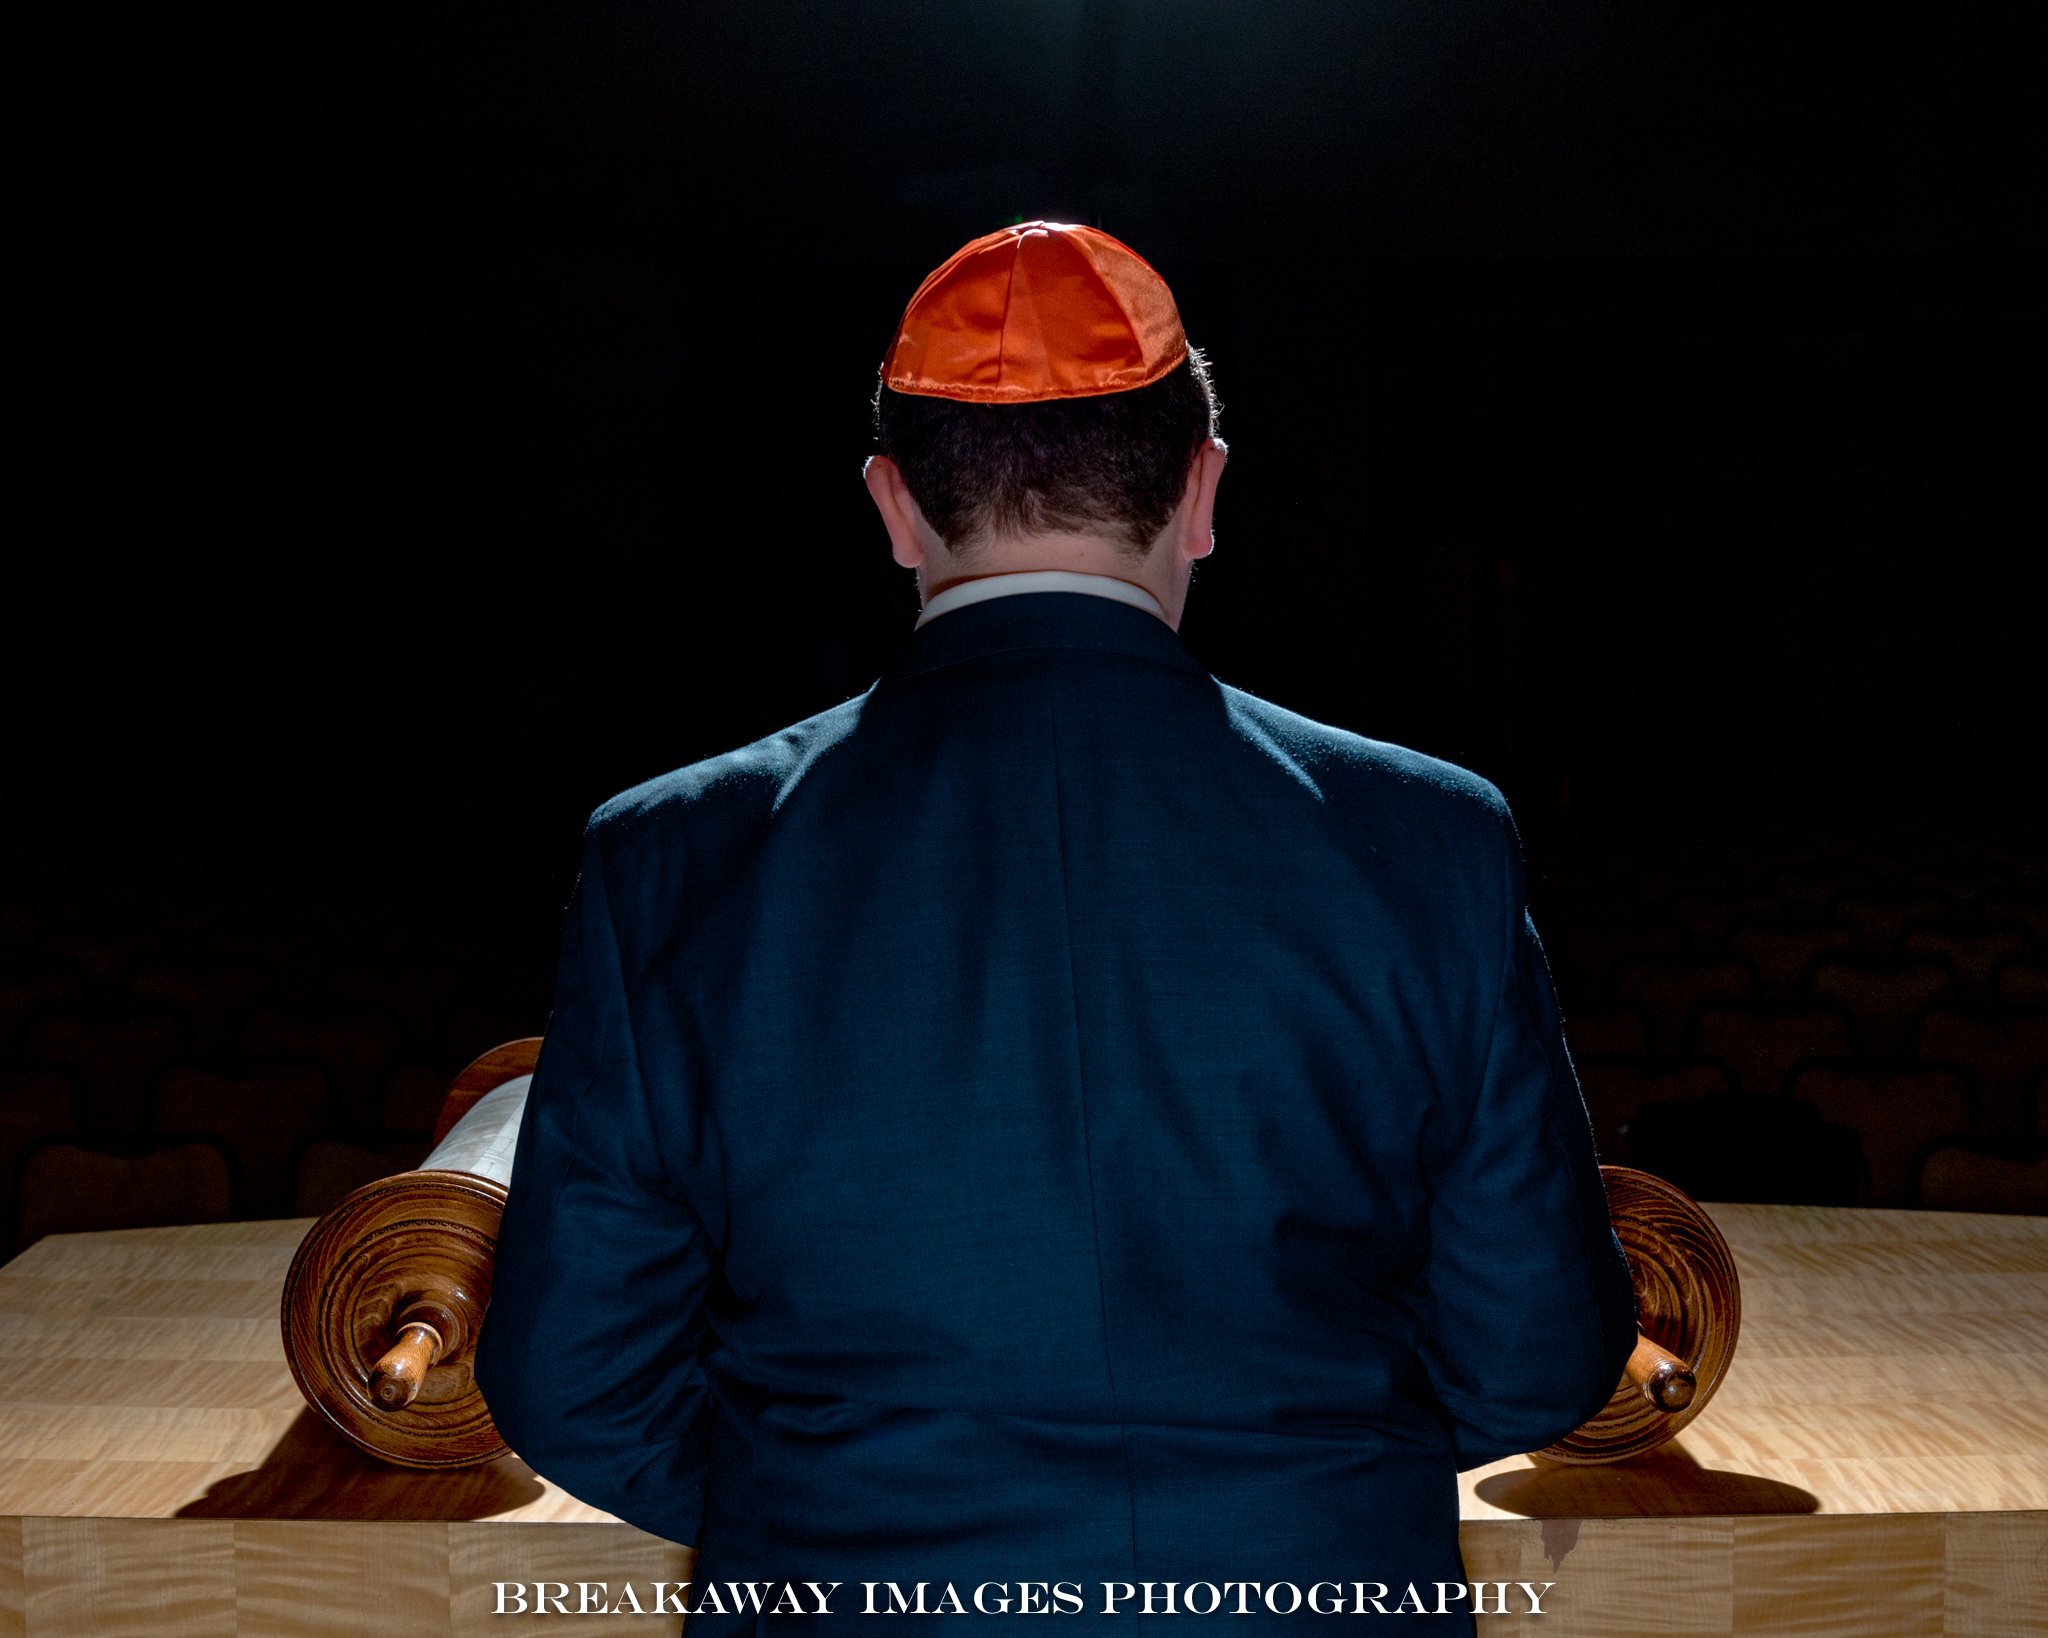 Matthew Levithan Bar Mitzvah 2019-01-19 v-1.jpg